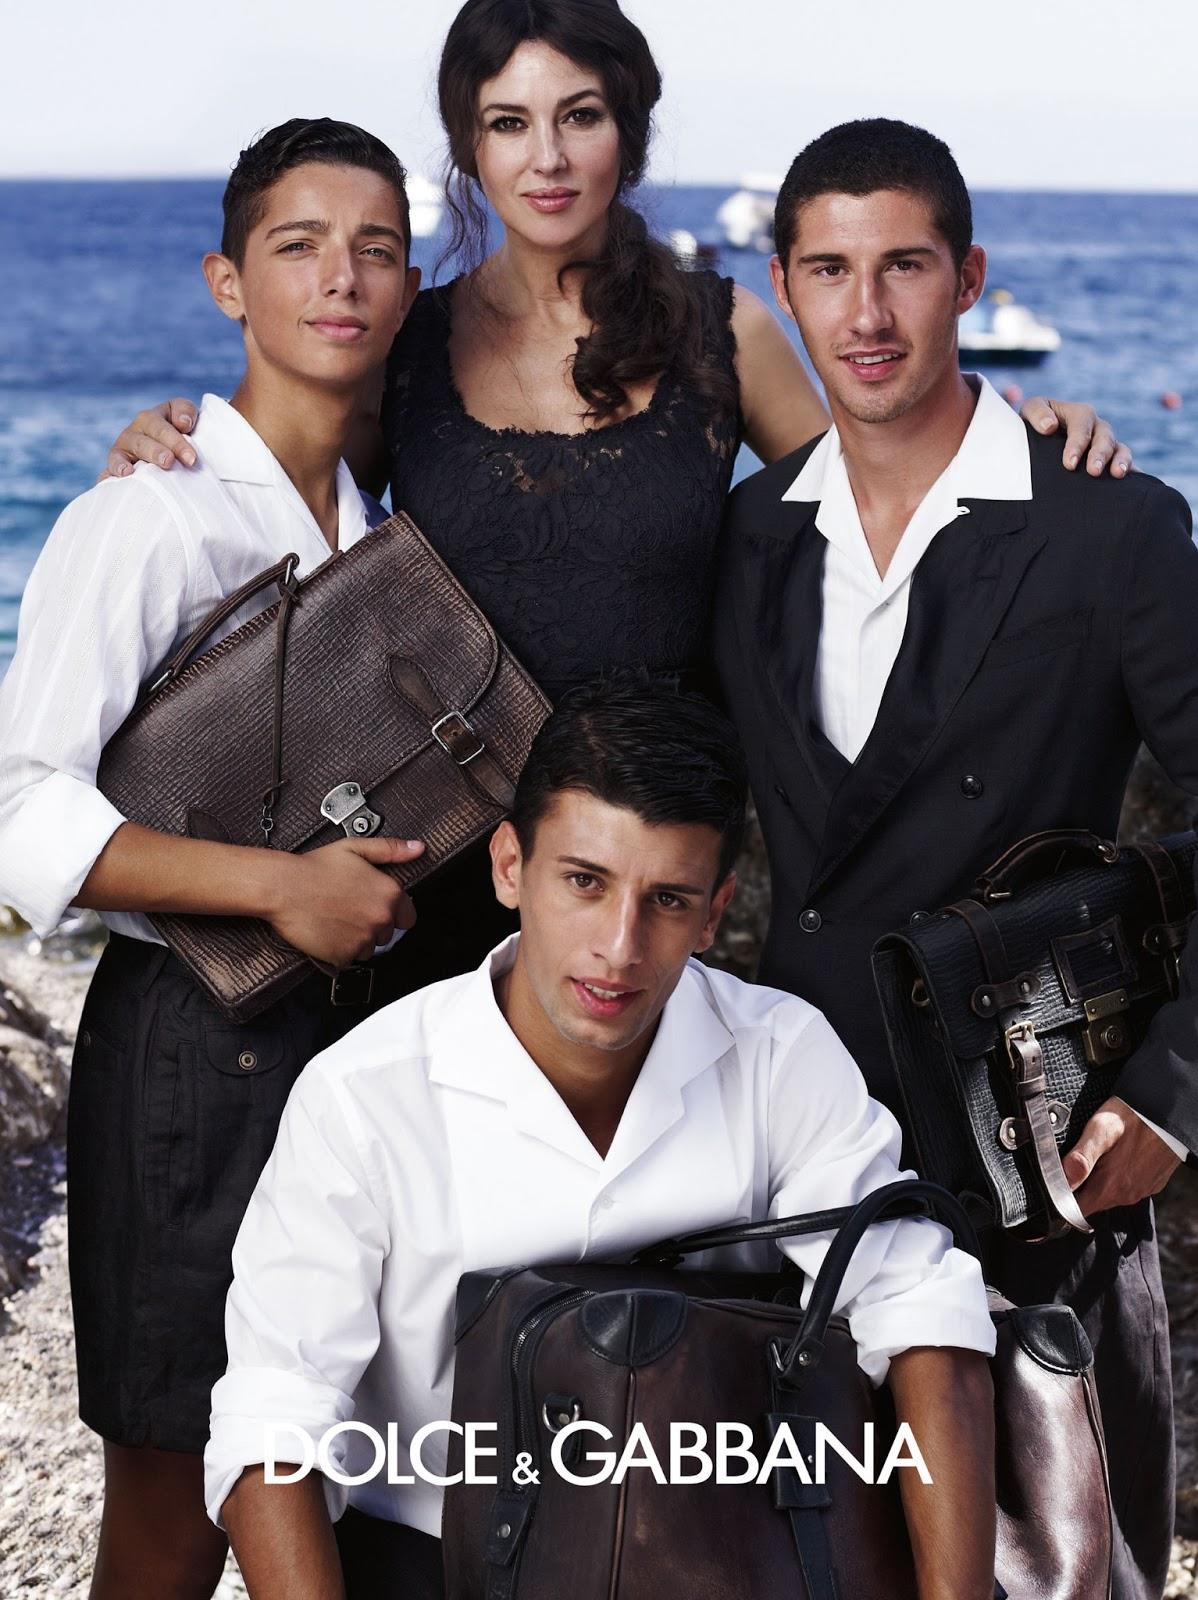 dolce-gabbana-adv-campaign-ss-2013-men-12